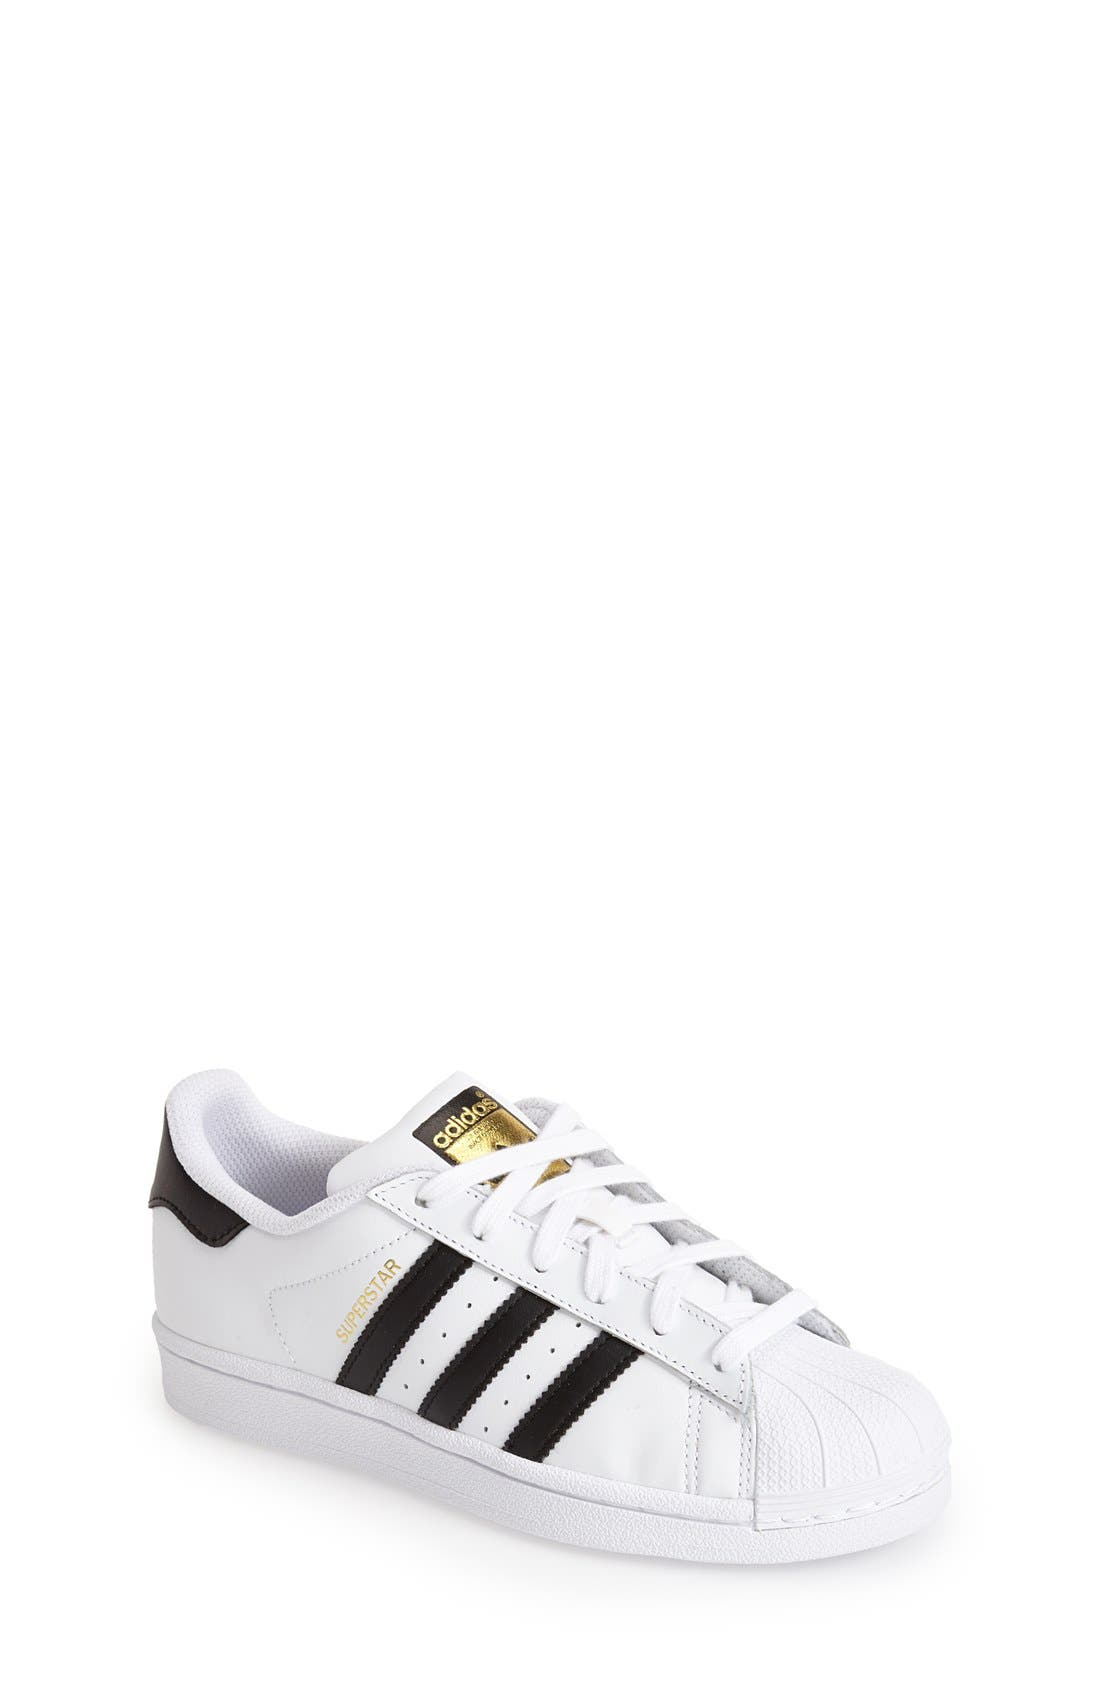 Main Image - adidas \u0027Superstar II\u0027 Sneaker (Big Kid). Color: White/ Black/  White